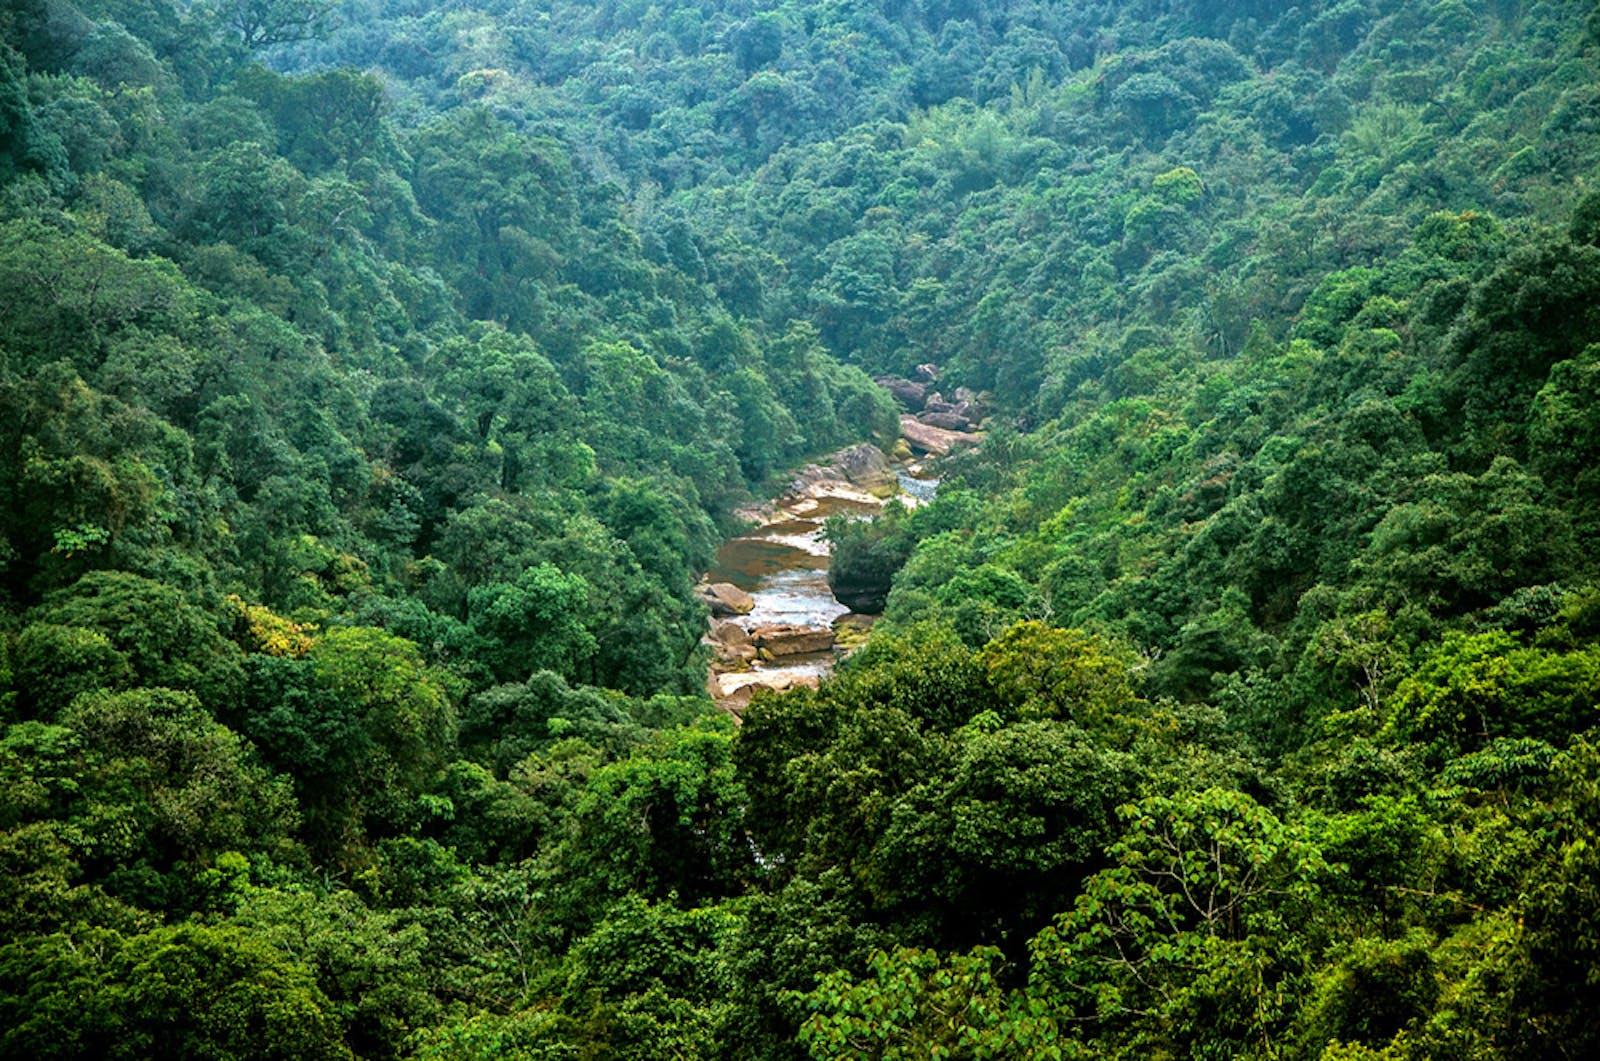 Meghalaya Subtropical Forests